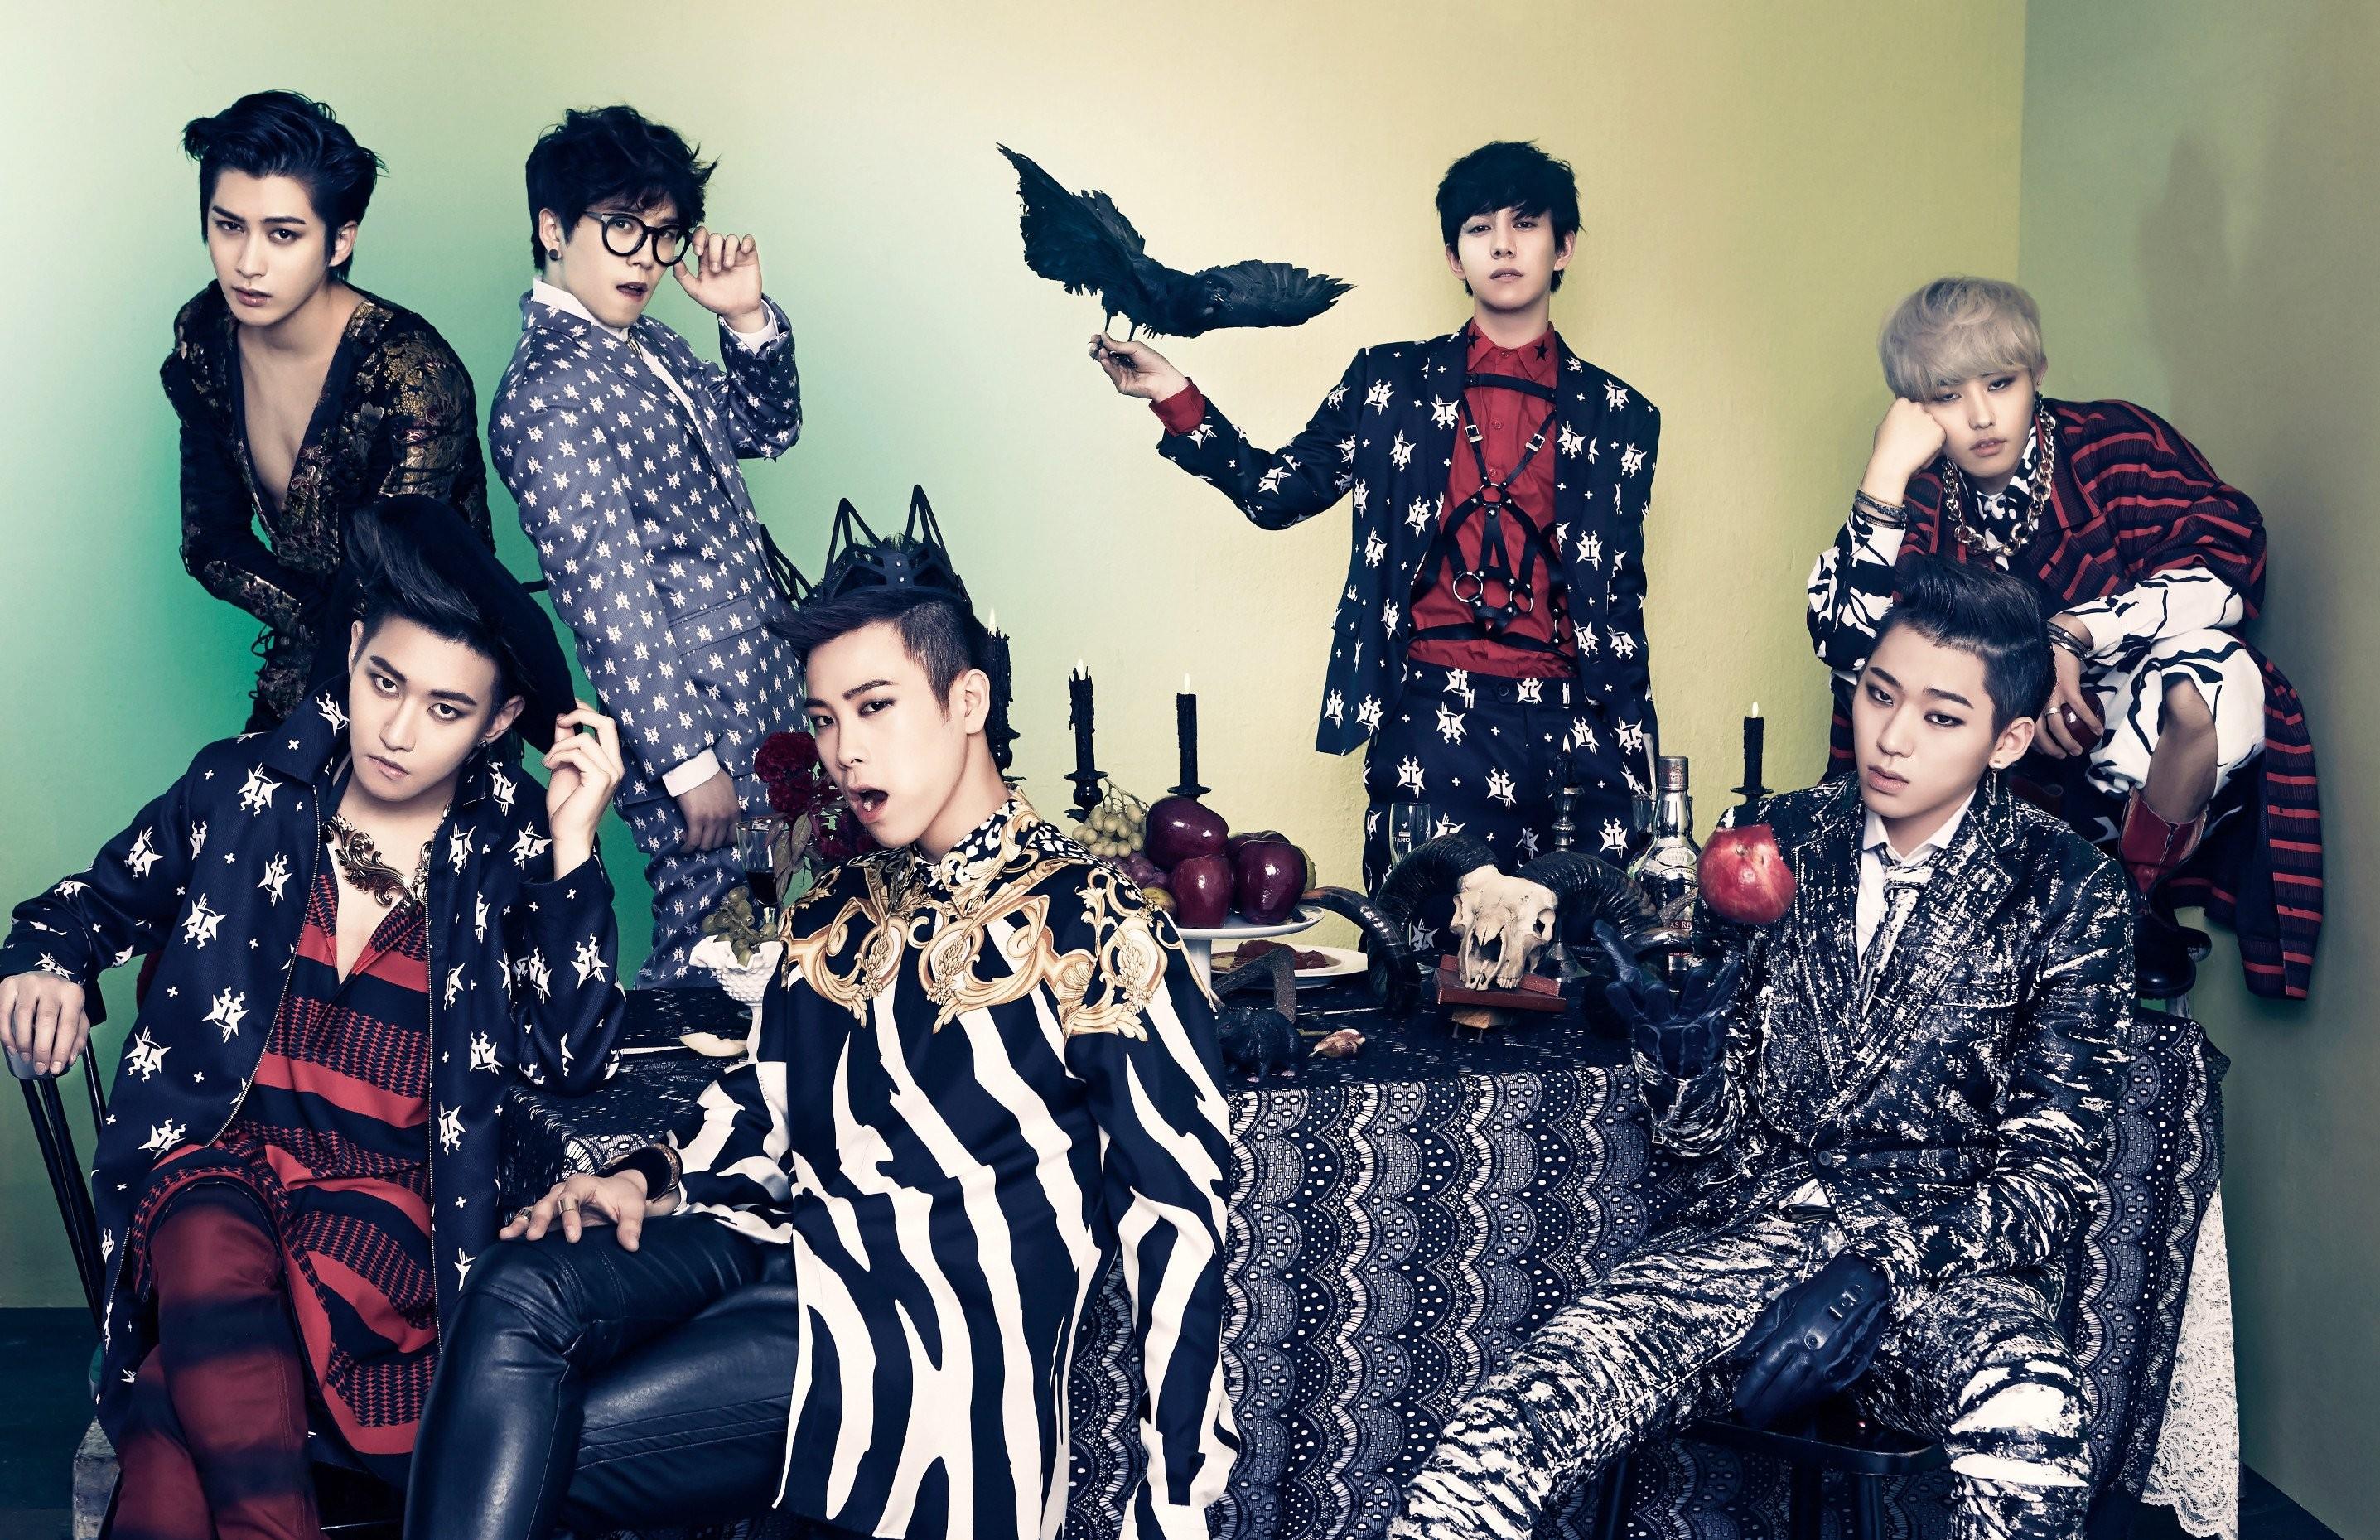 Wallpaper Men People Musician Fashion Korean K Pop